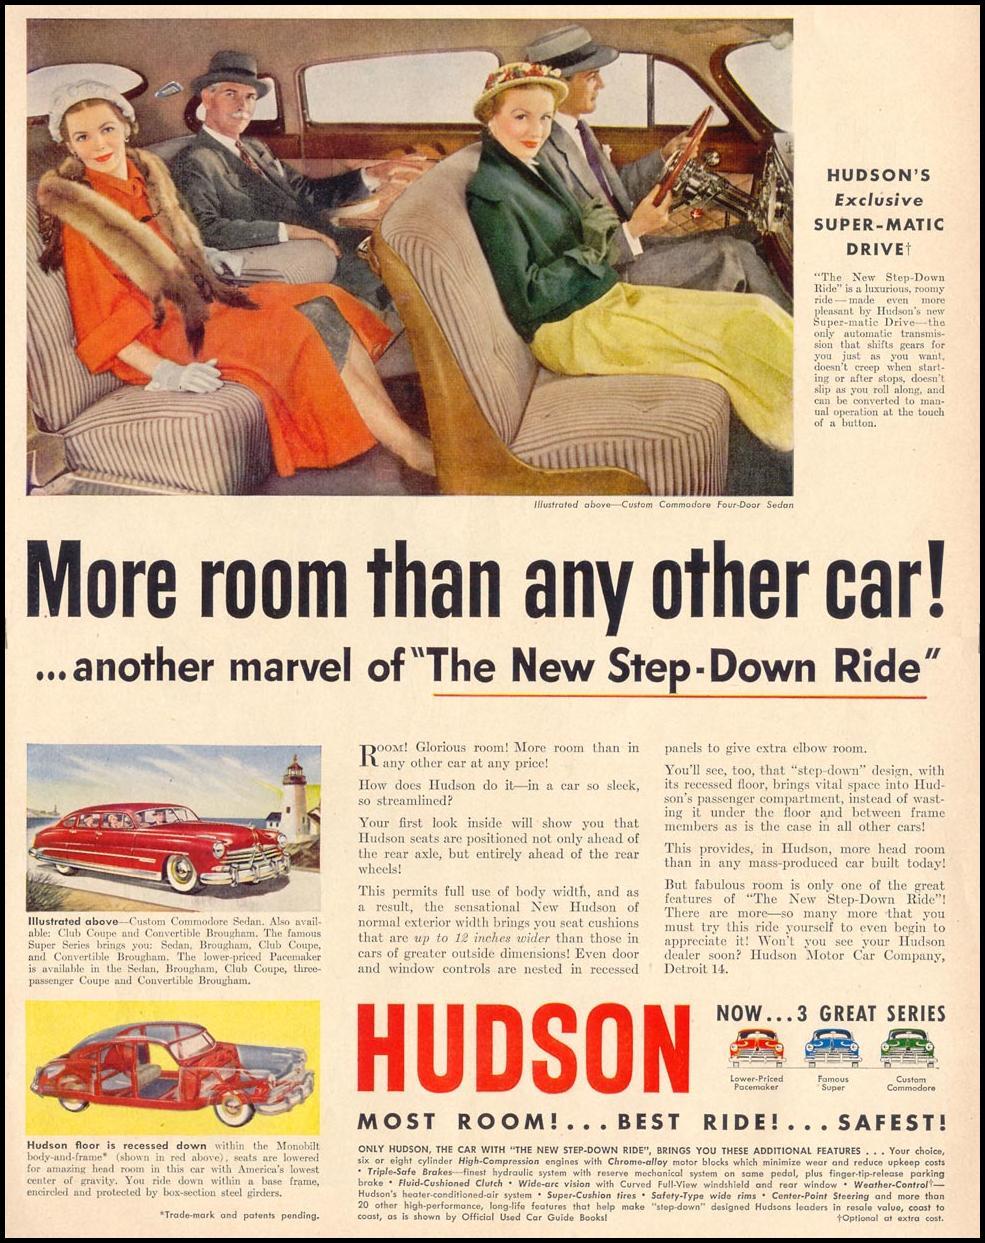 HUDSON AUTOMOBILES LIFE 04/17/1950 p. 79